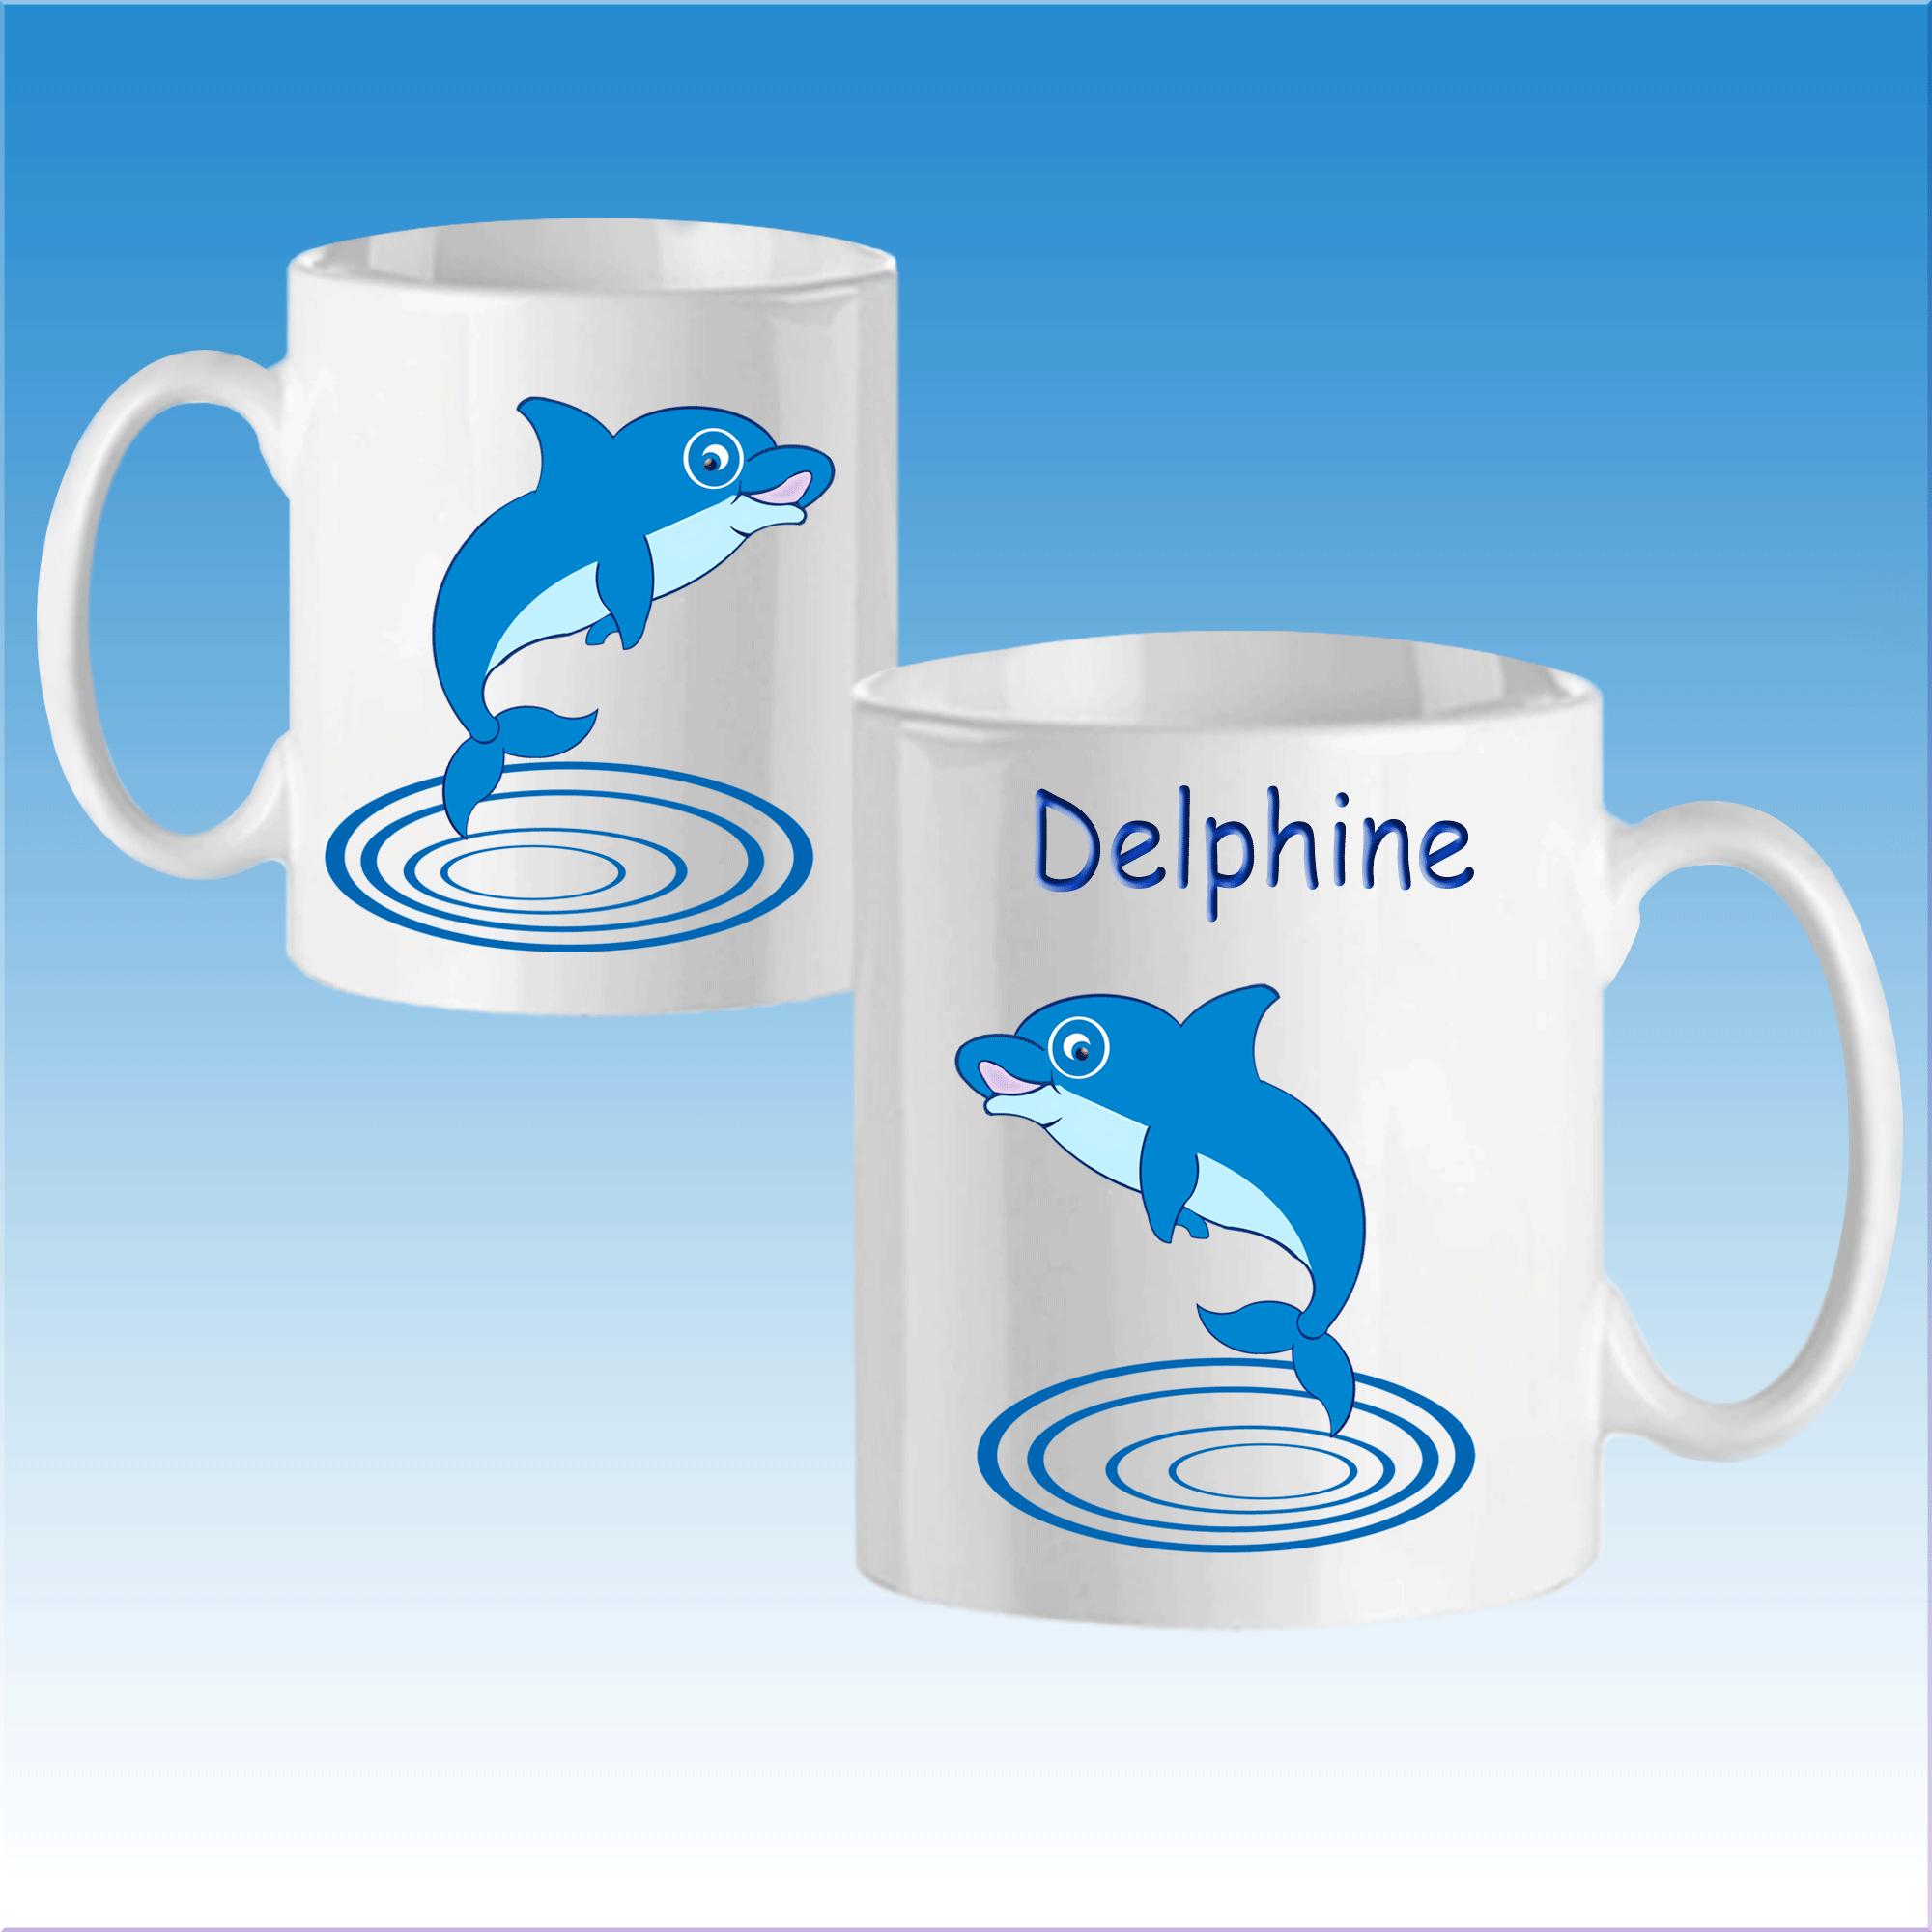 mug-dauphin-prenom-personnalisable-personnalisation-personnalise-blanc-ceramique-tasse-mer-ocean-poisson-delphine